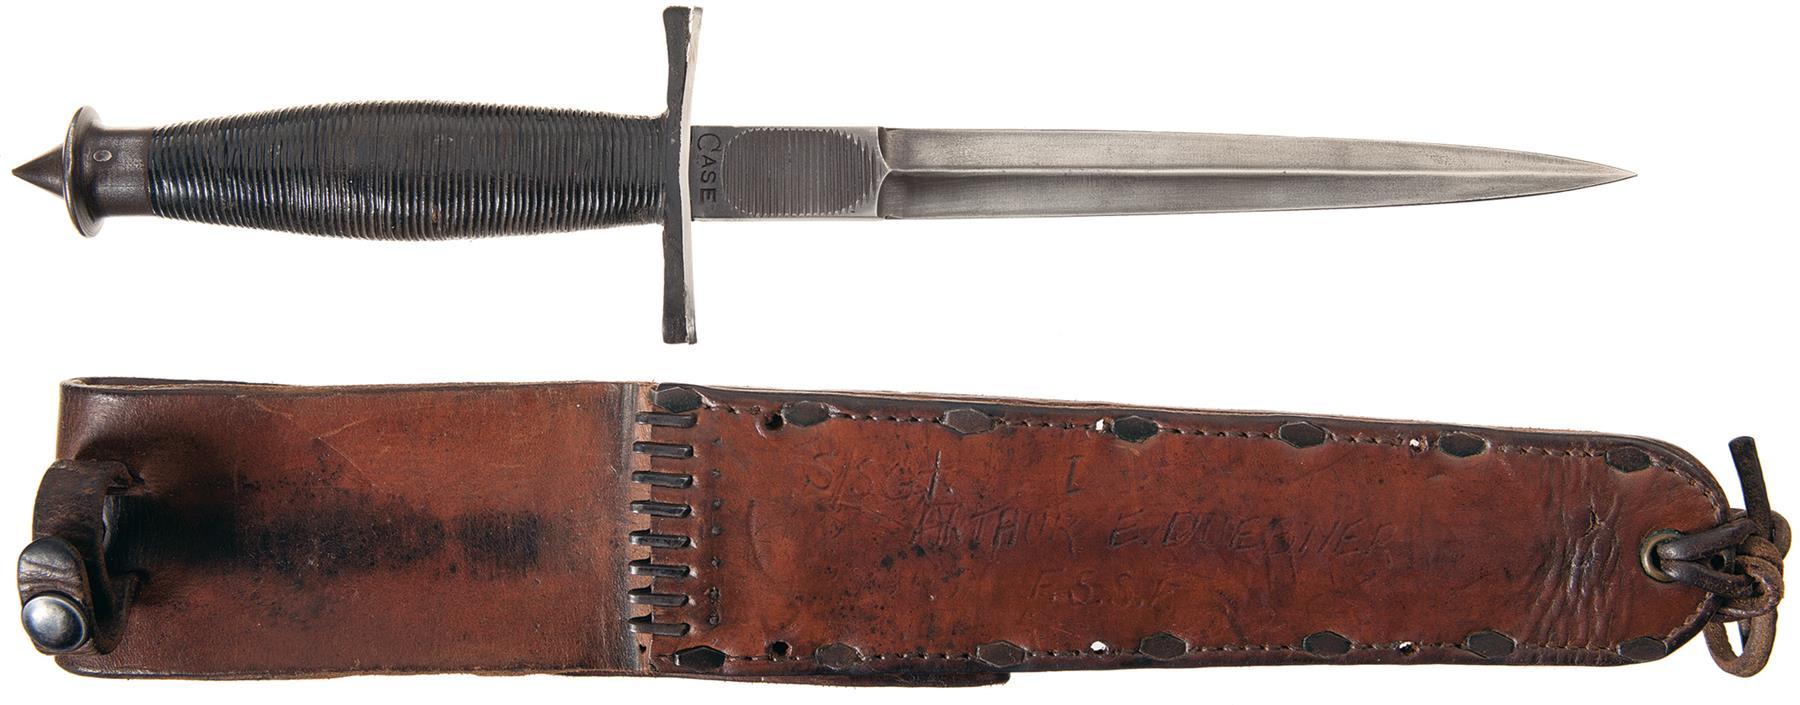 Rare Combat Knives